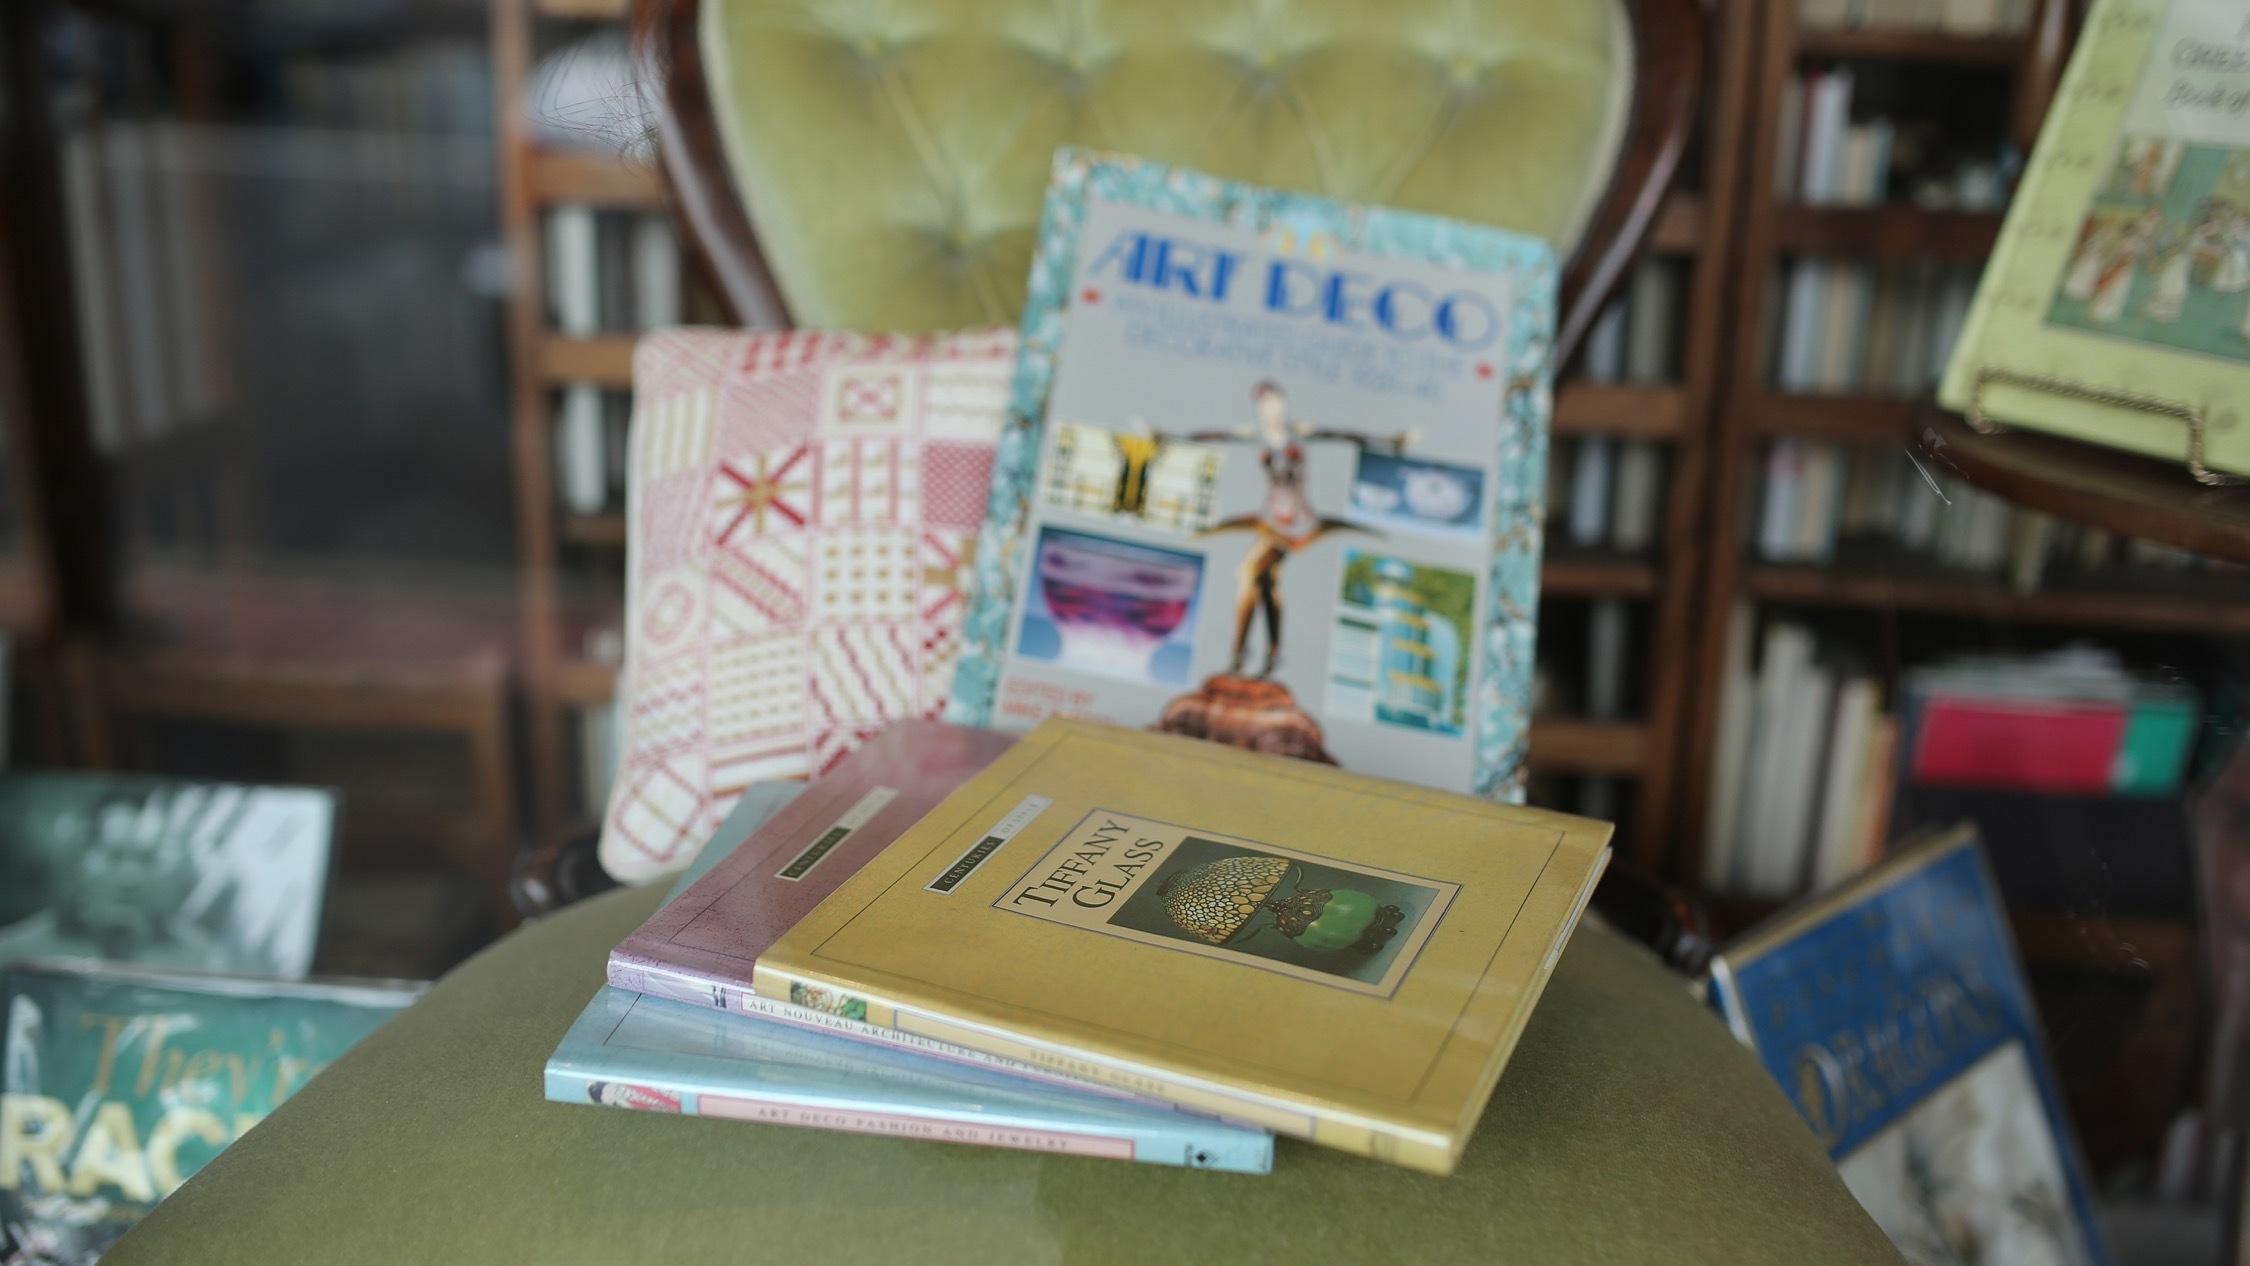 Books at Love Vintage Books